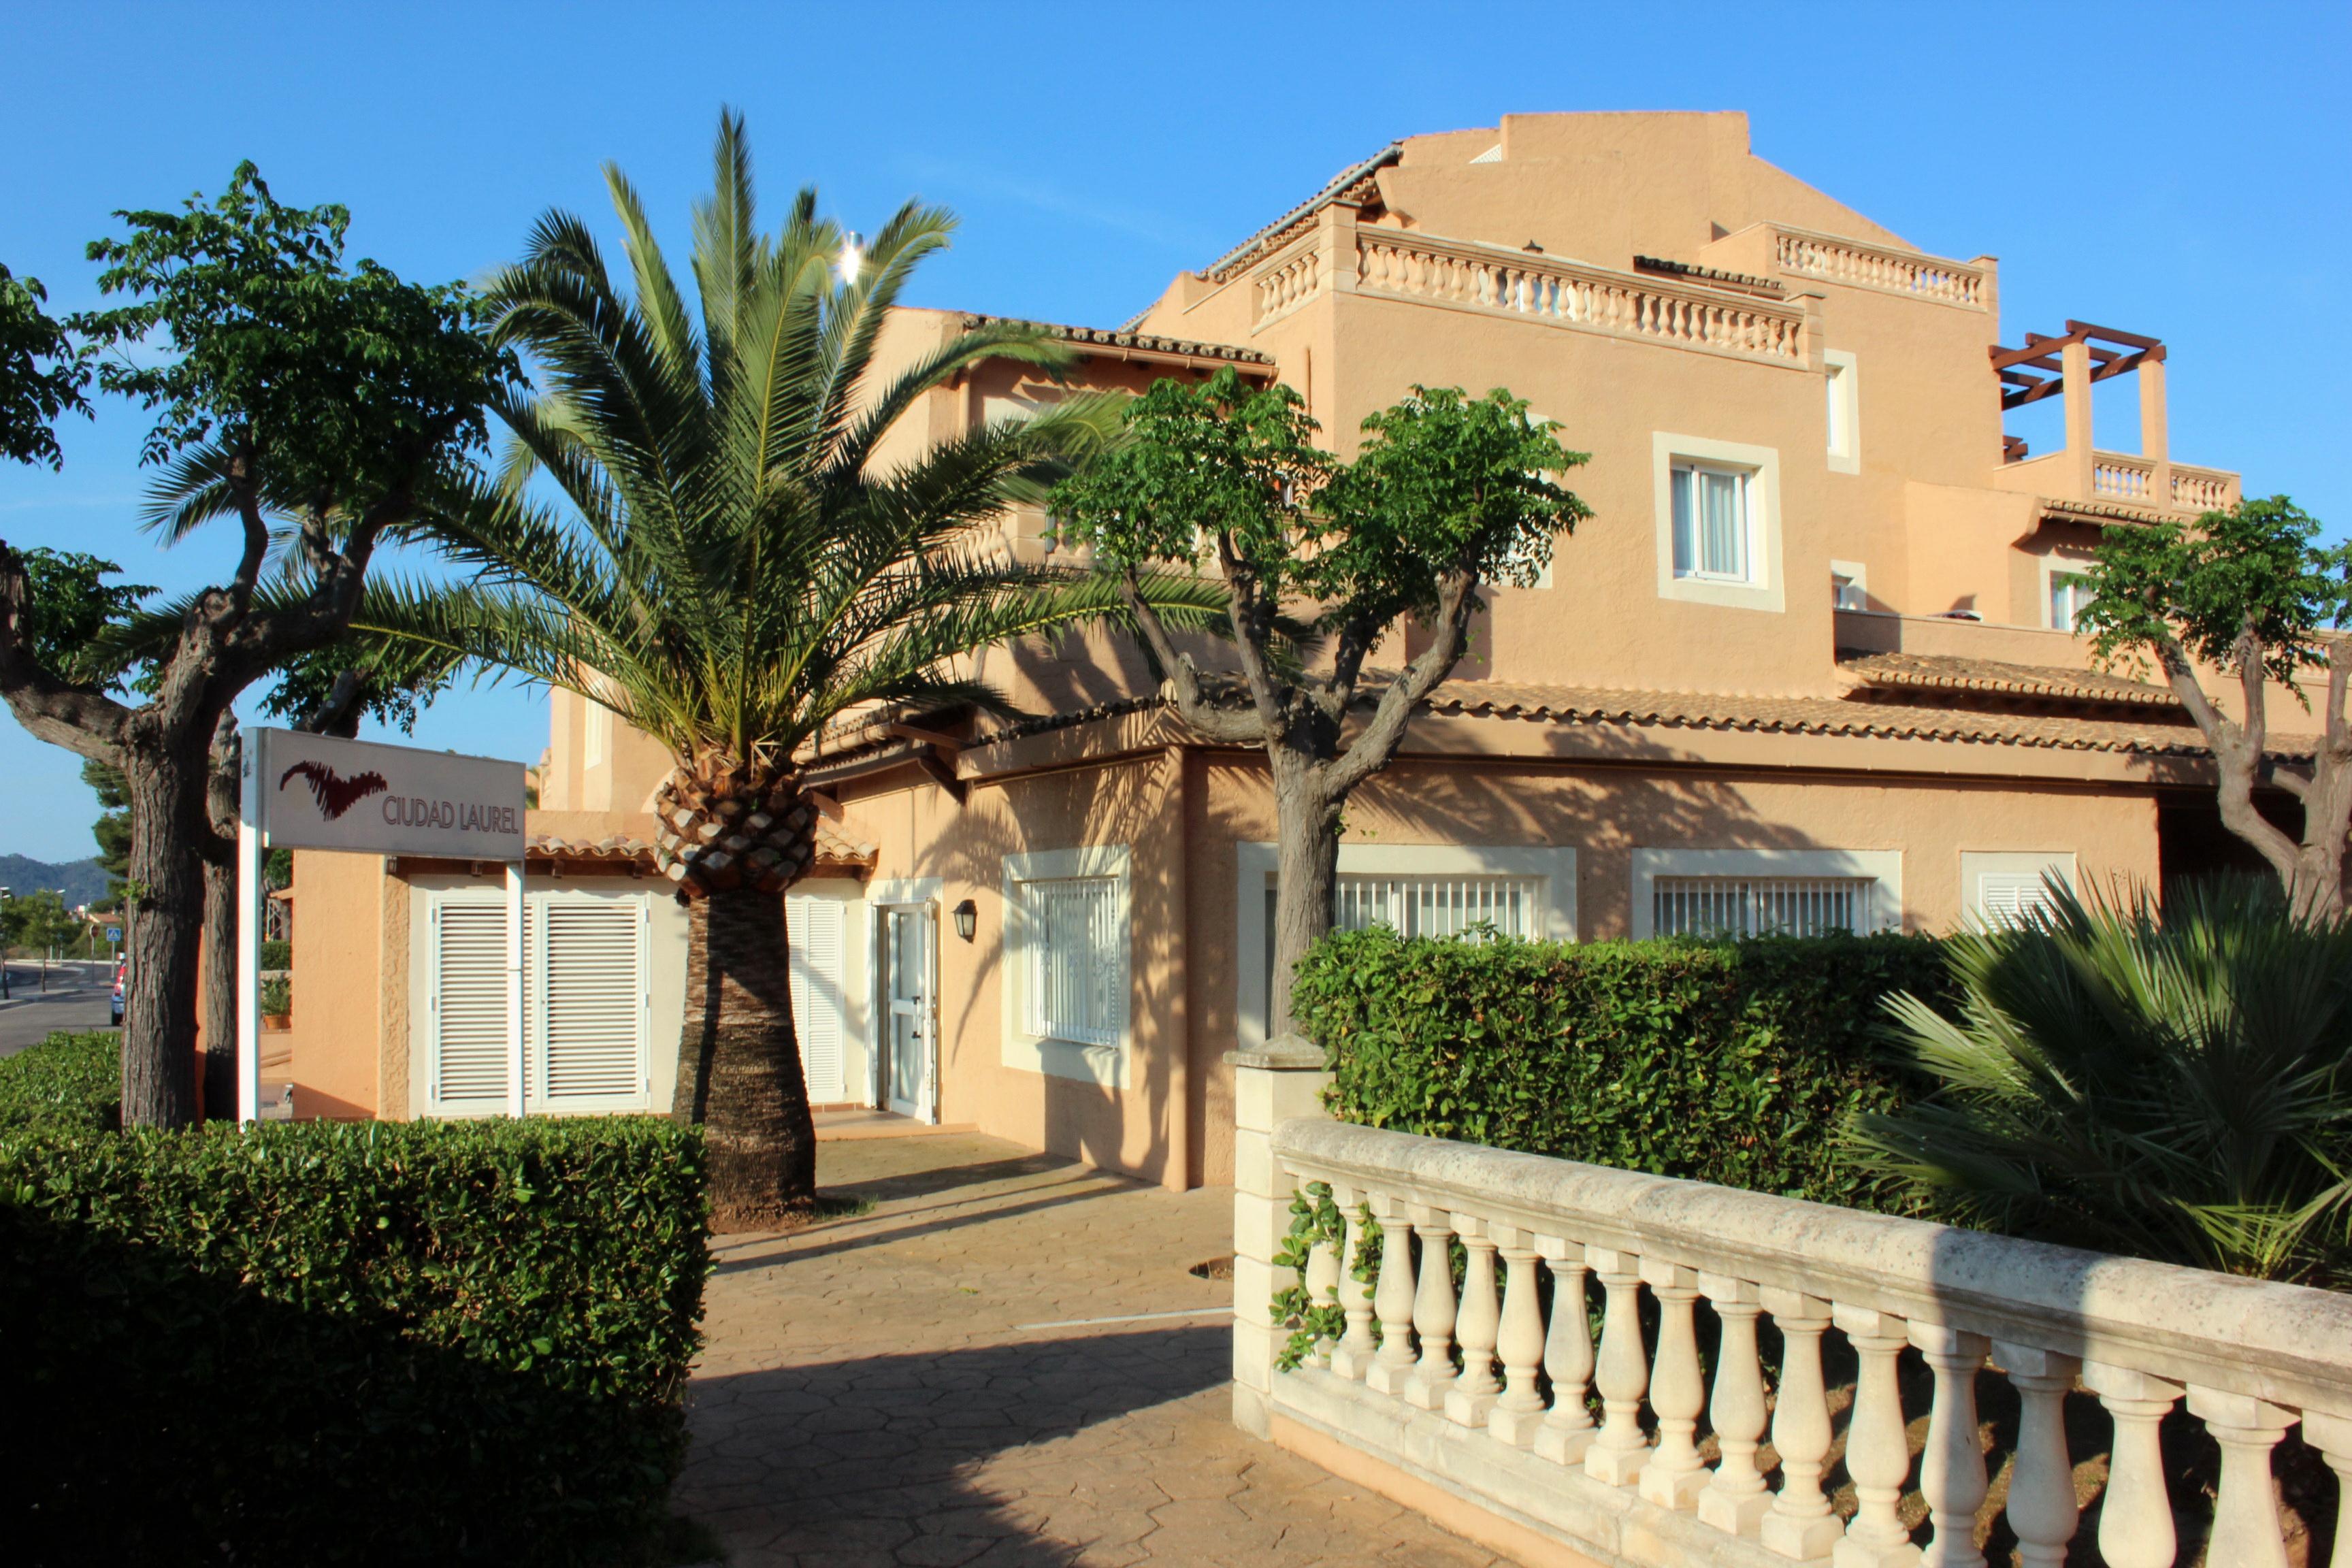 Http Www Hotels In Naxos Gr Naxosbuses Html